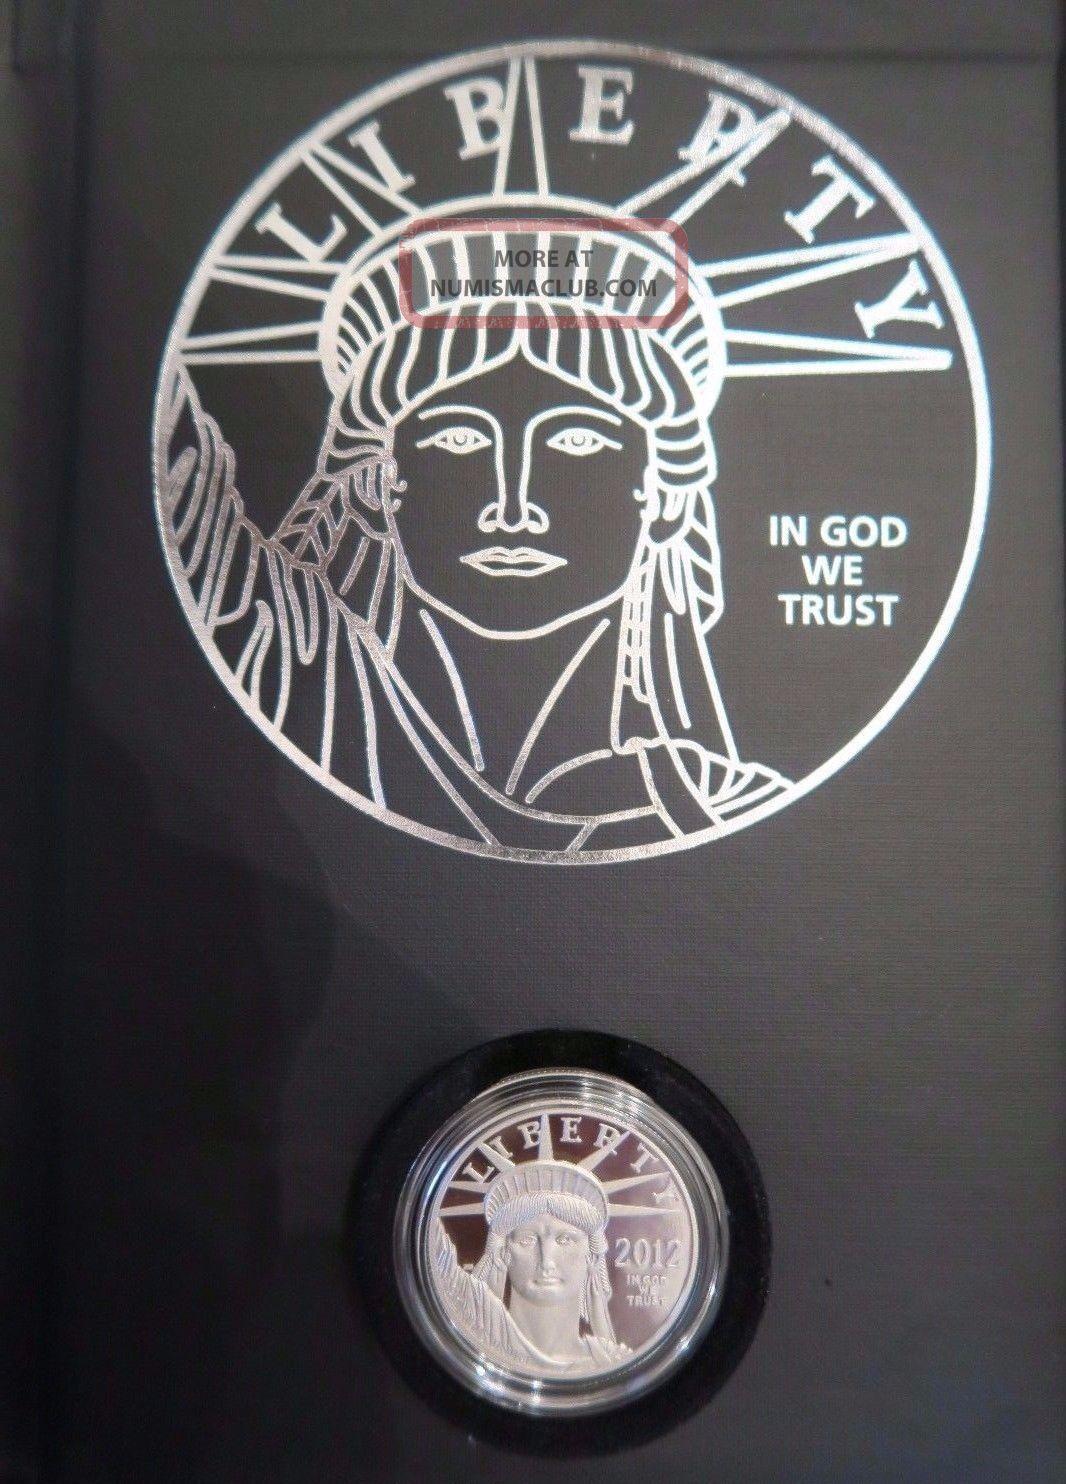 2012w Platinum Proof Eagle Preamble Series Us $100 Face Value W/carrier&box Platinum photo